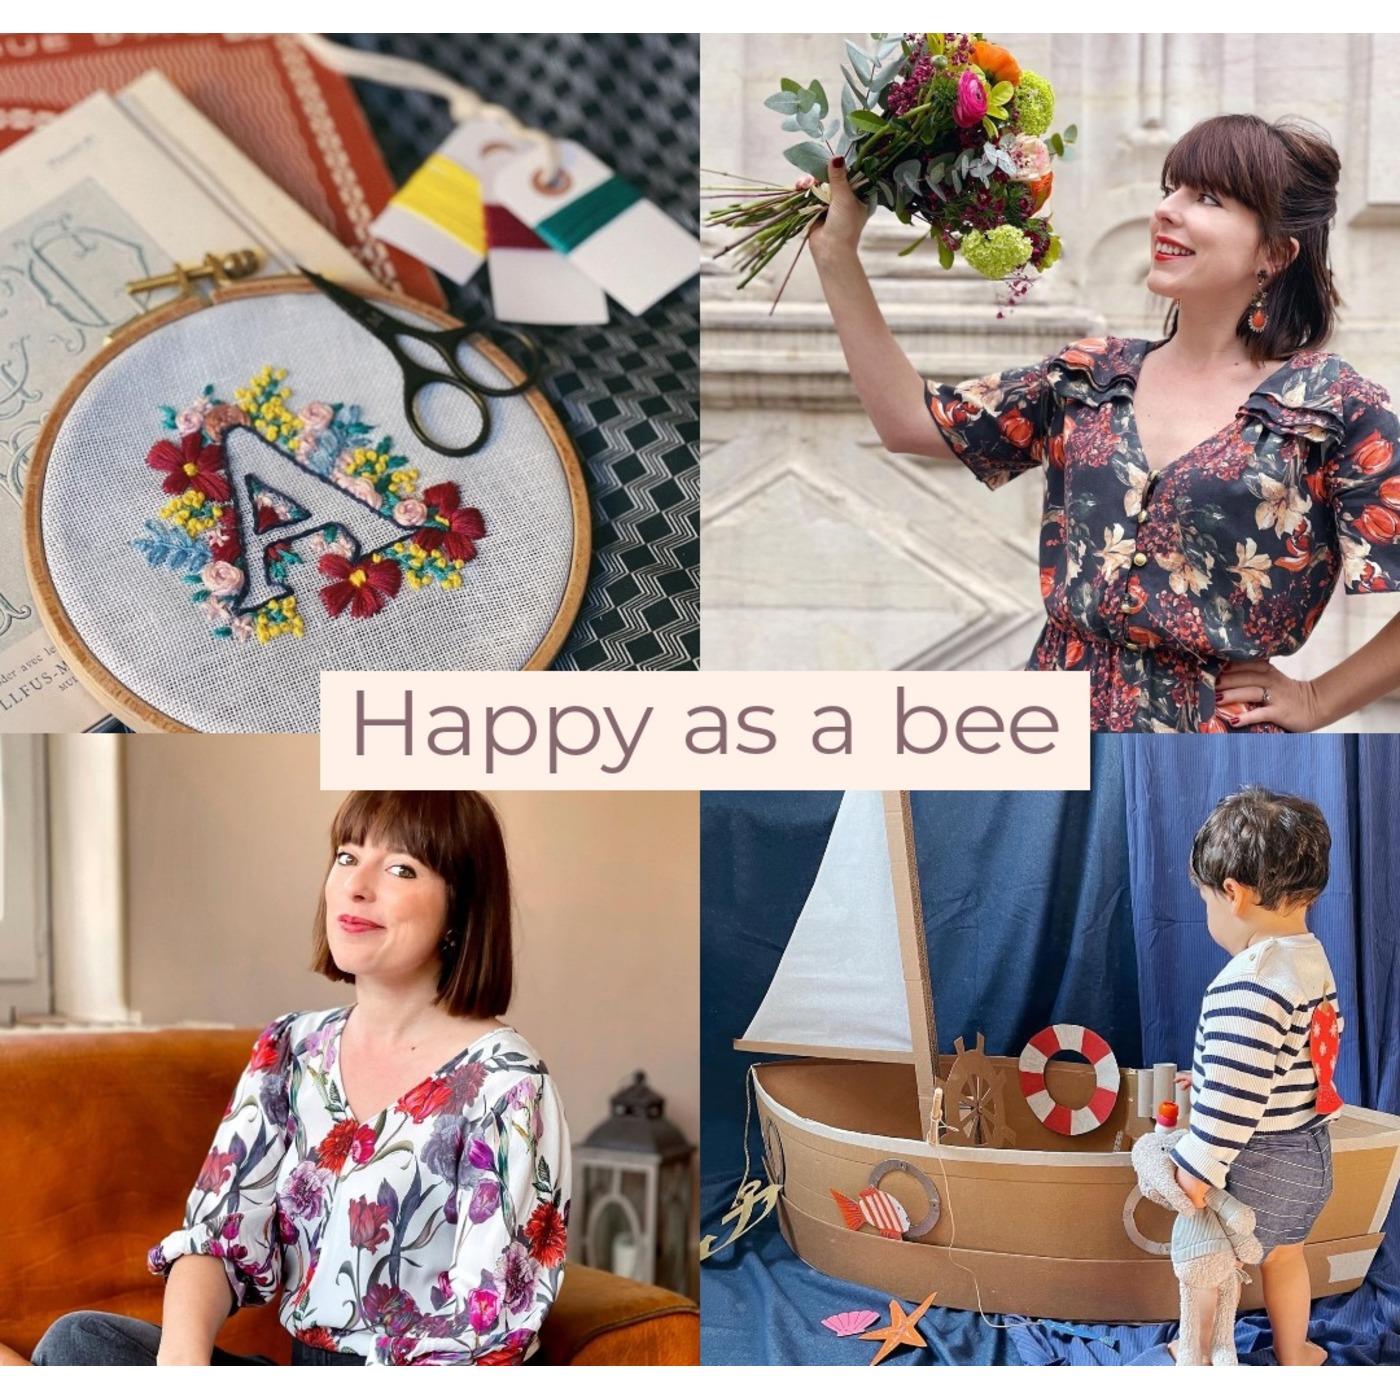 #51 Happy as a bee, crafting girl épanouie